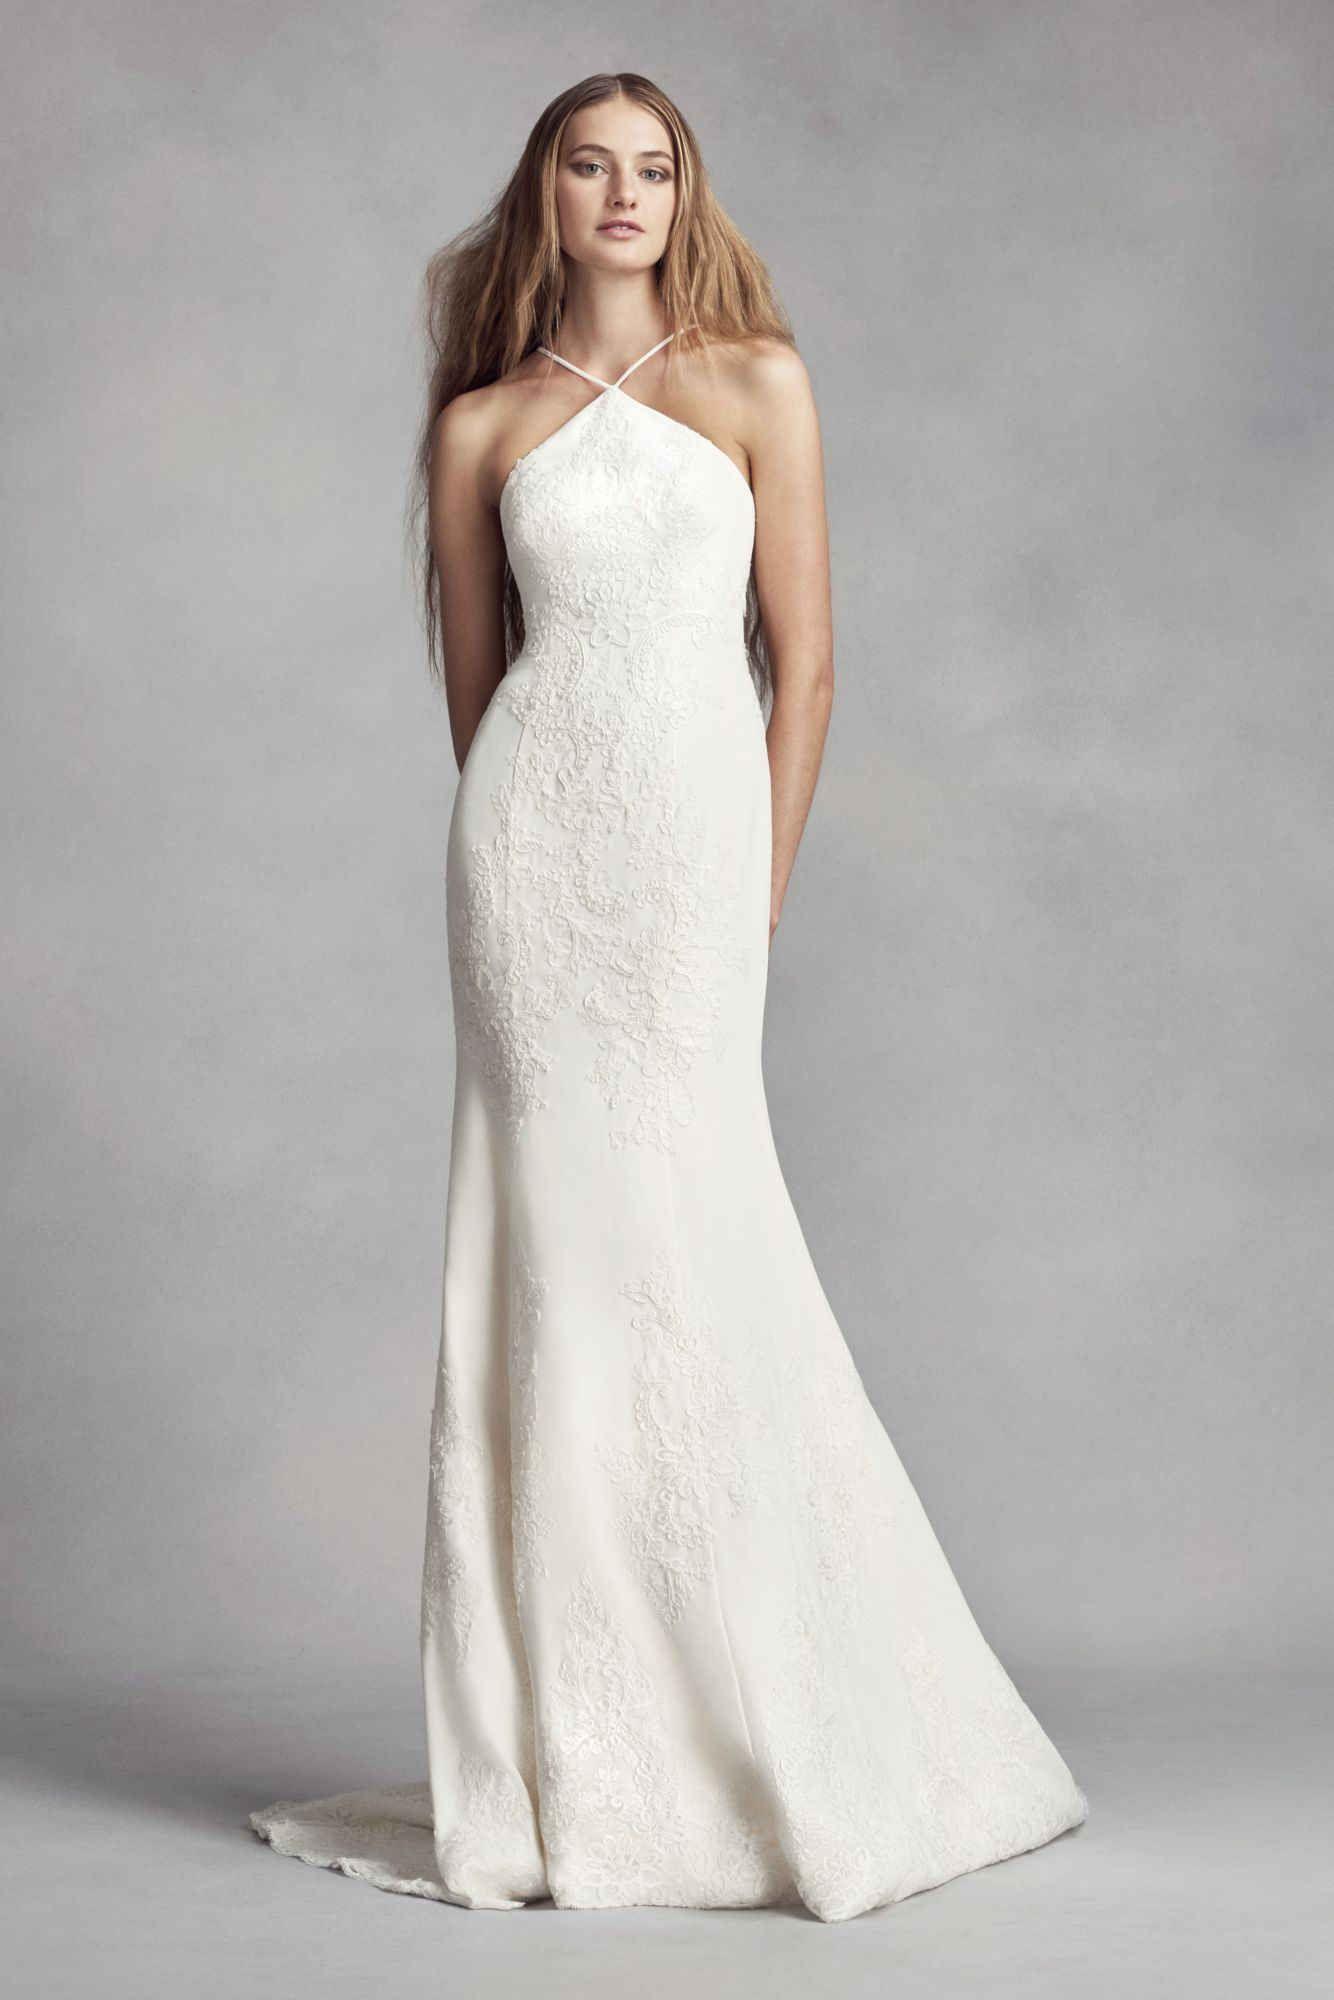 Elegant Halter Neck Long Sheath Lace Appliqued White By Vera Wang Wedding Gown Davids Bridal Wedding Dresses Halter Top Wedding Dress Wedding Dresses Vera Wang